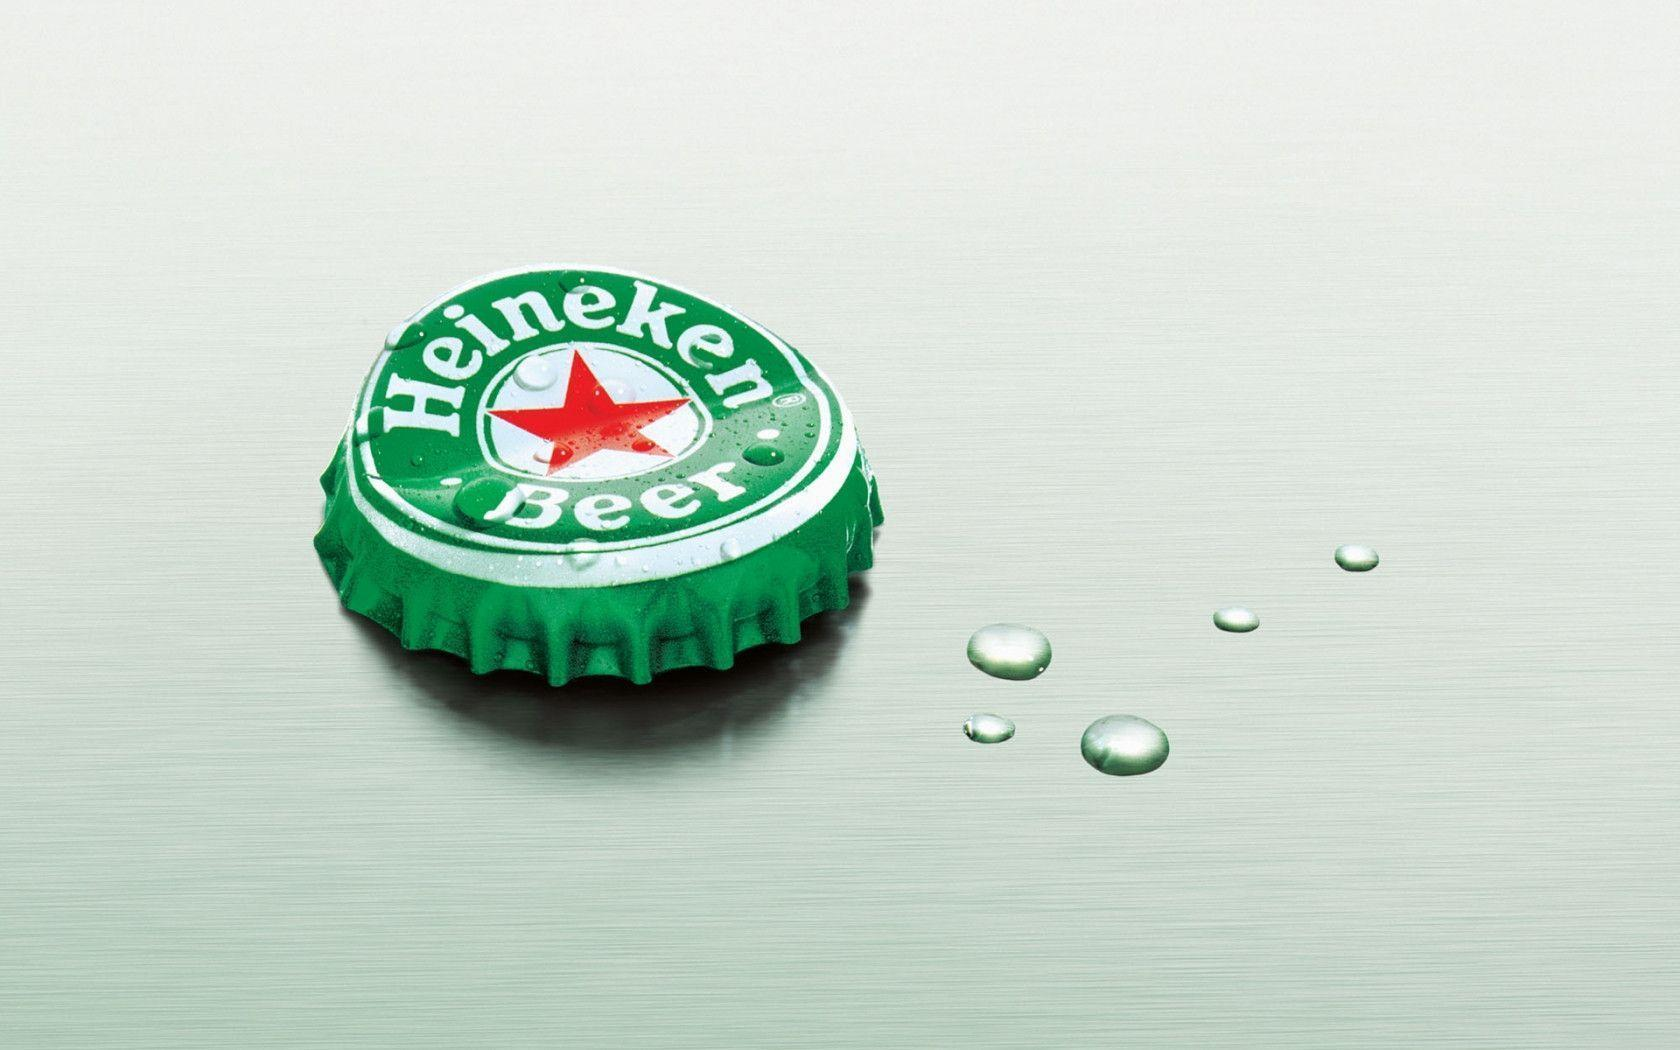 Heineken Wallpaper Hd heineken wallpapers - wallpaper cave